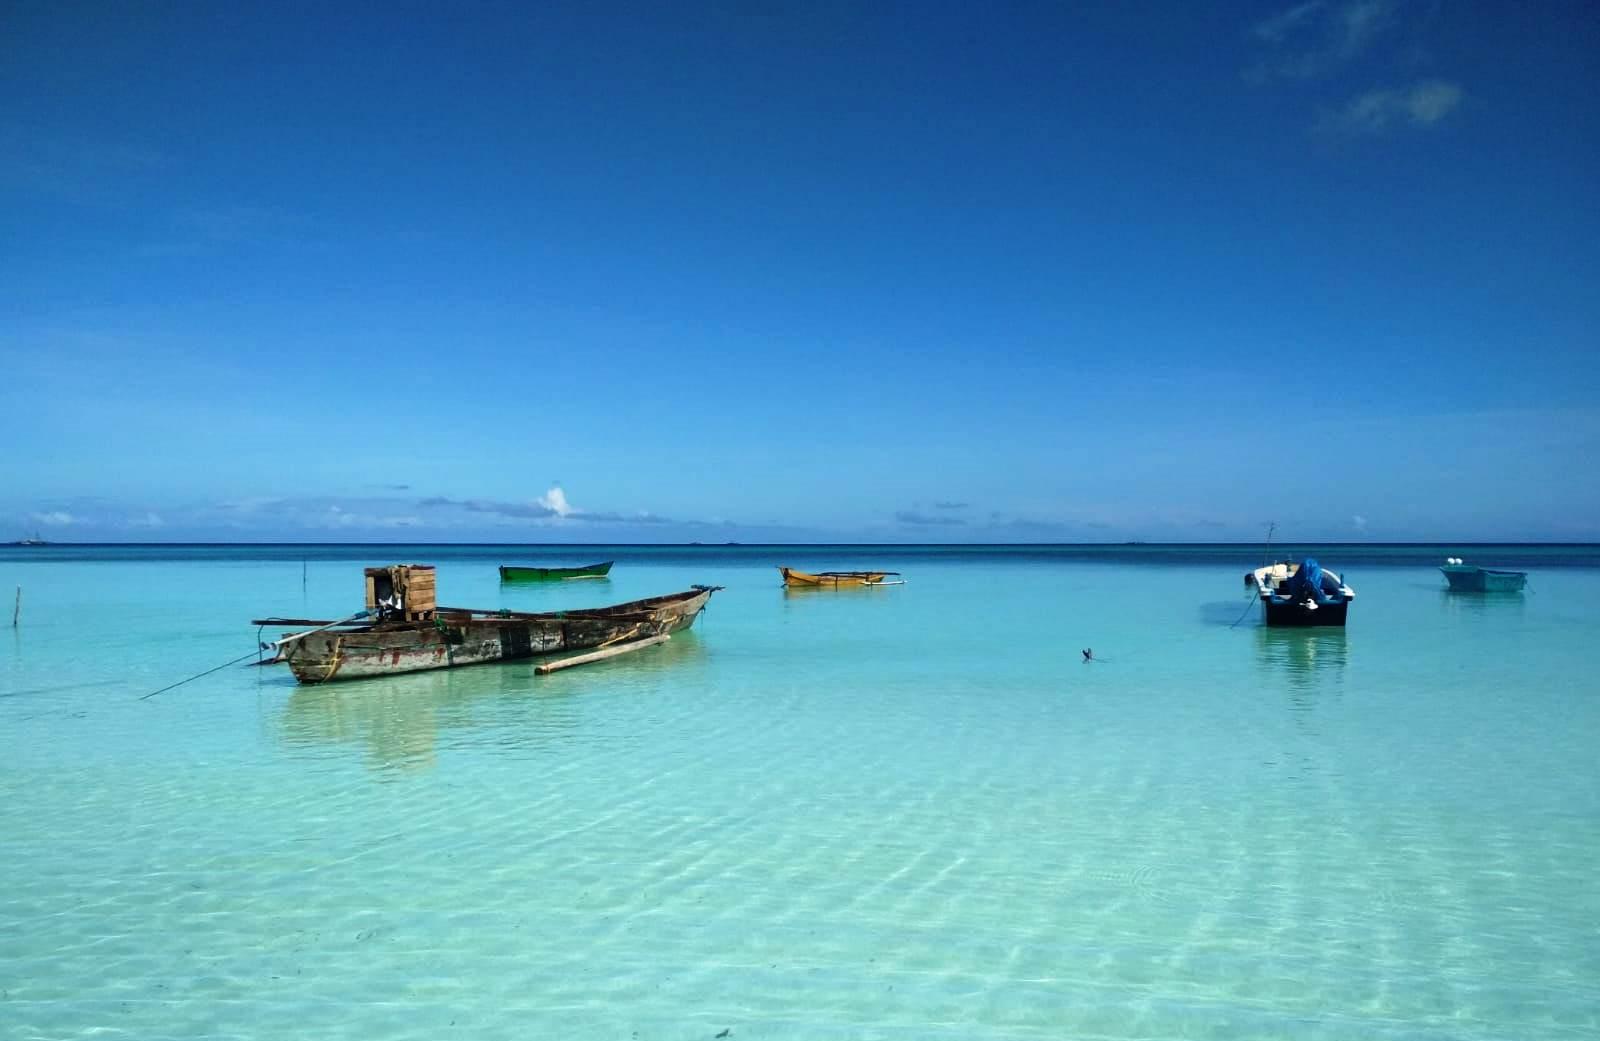 Kei ostrovy